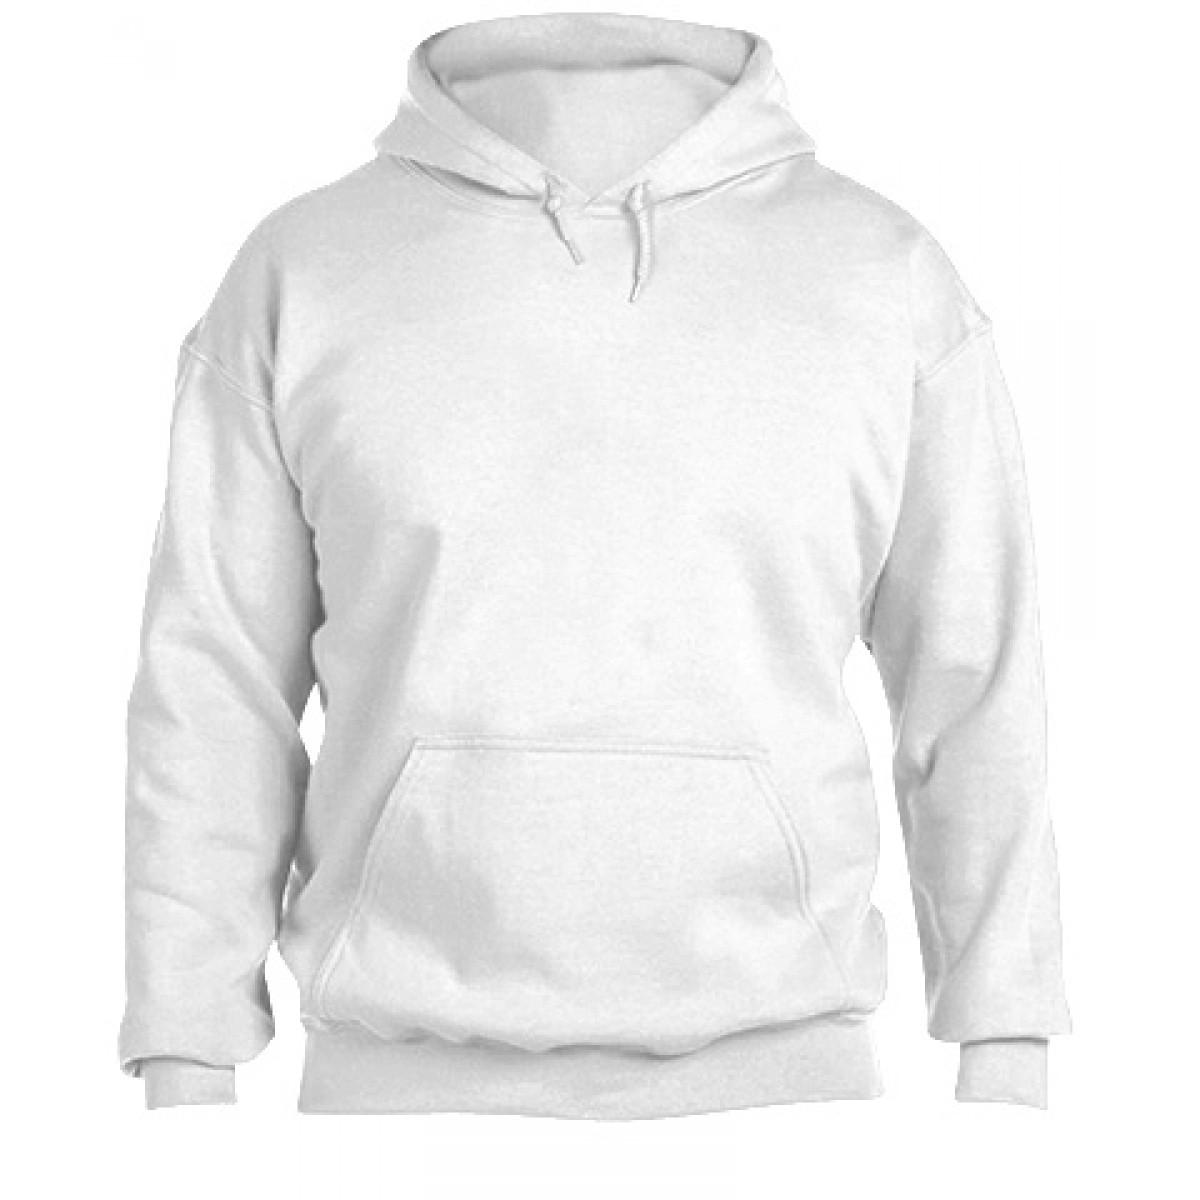 Hooded Sweatshirt 50/50 Heavy Blend -White-XL